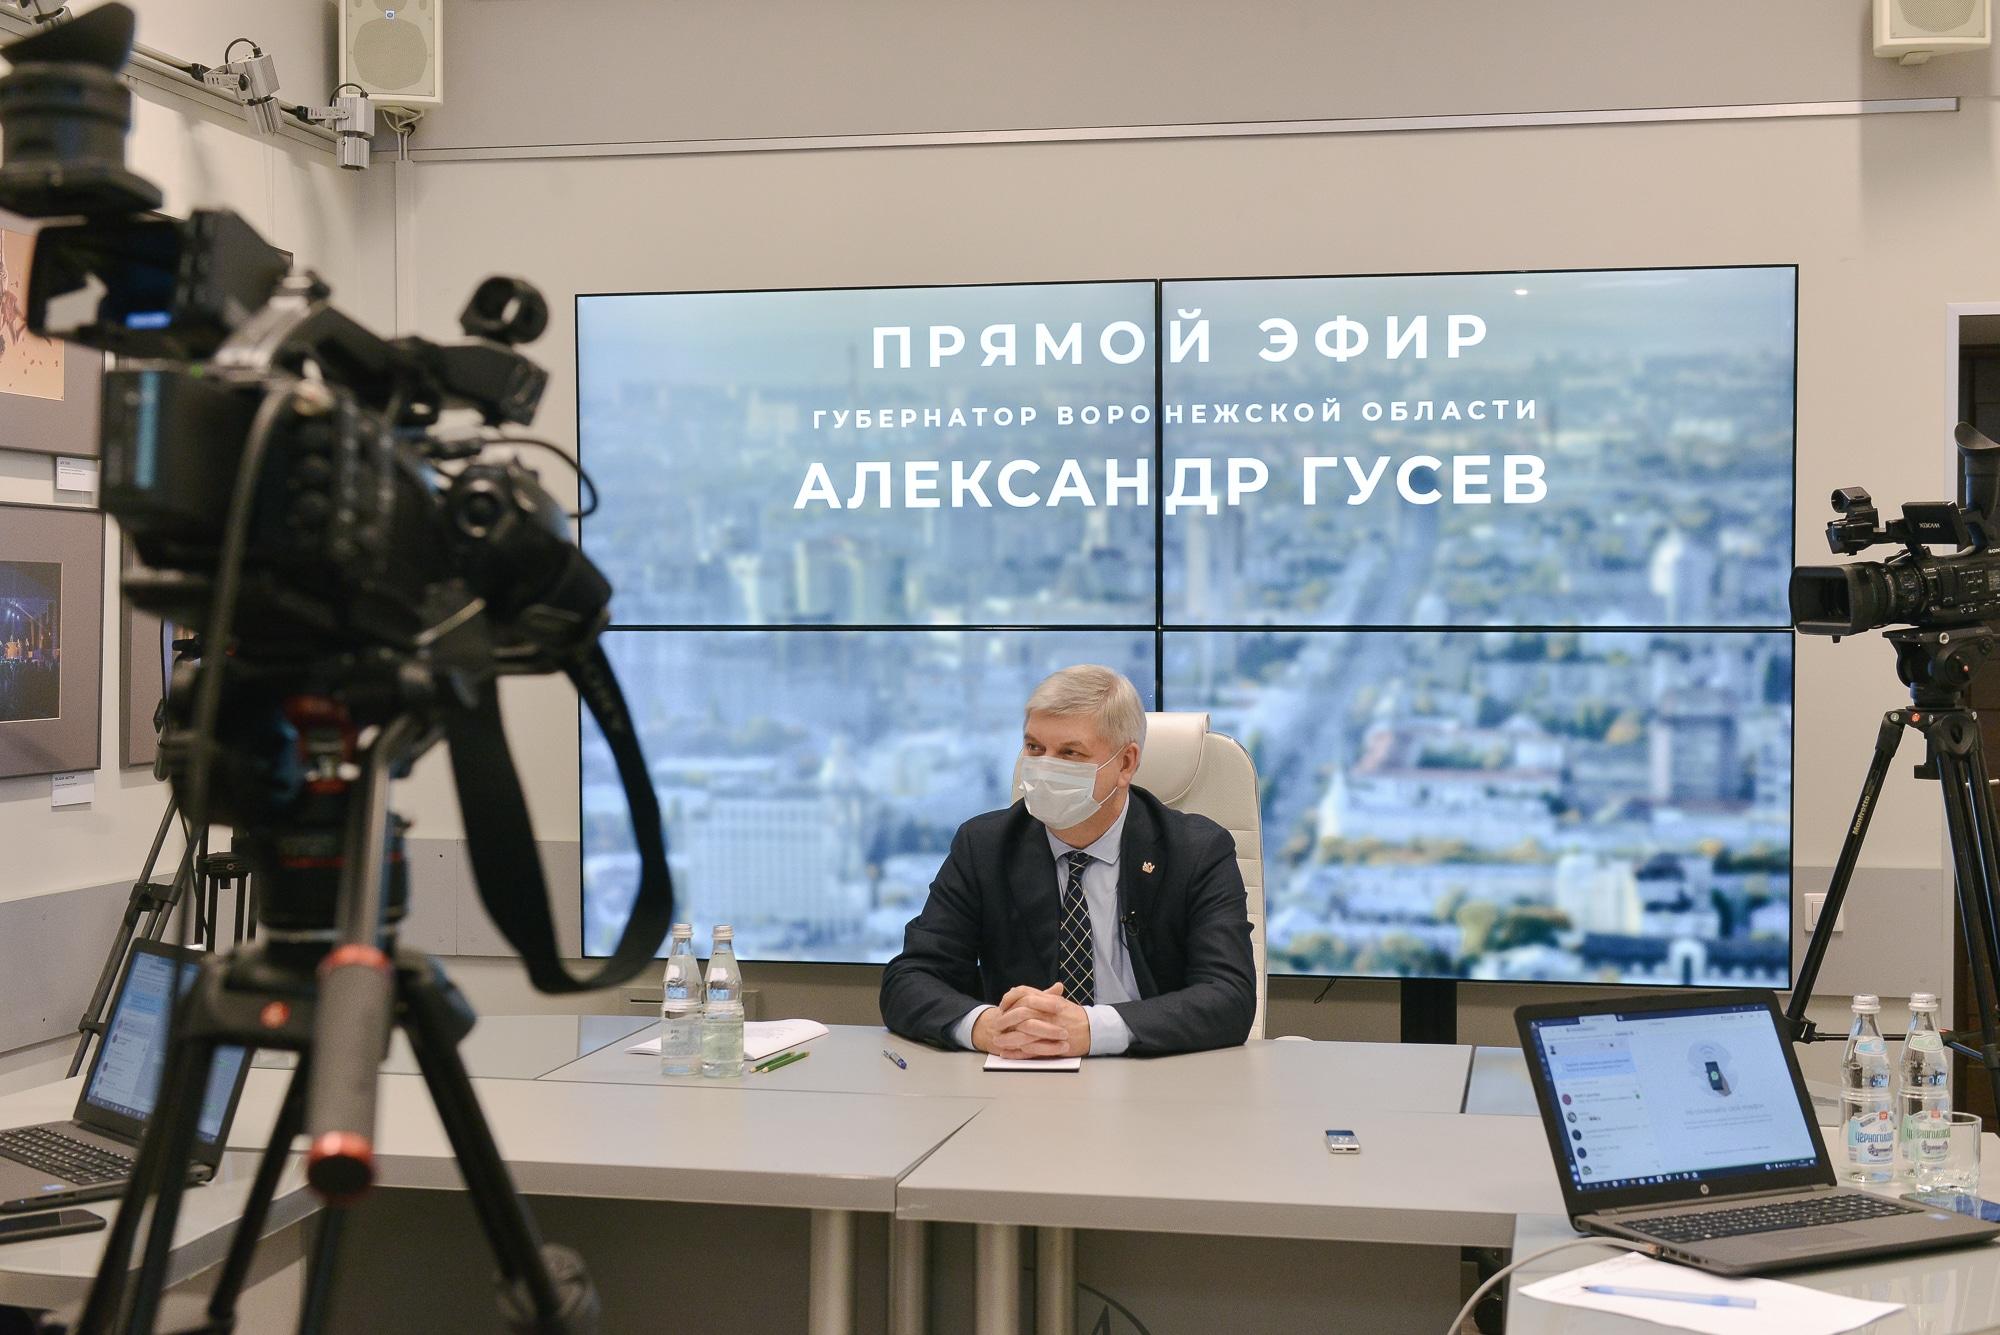 Гусев Воронеж